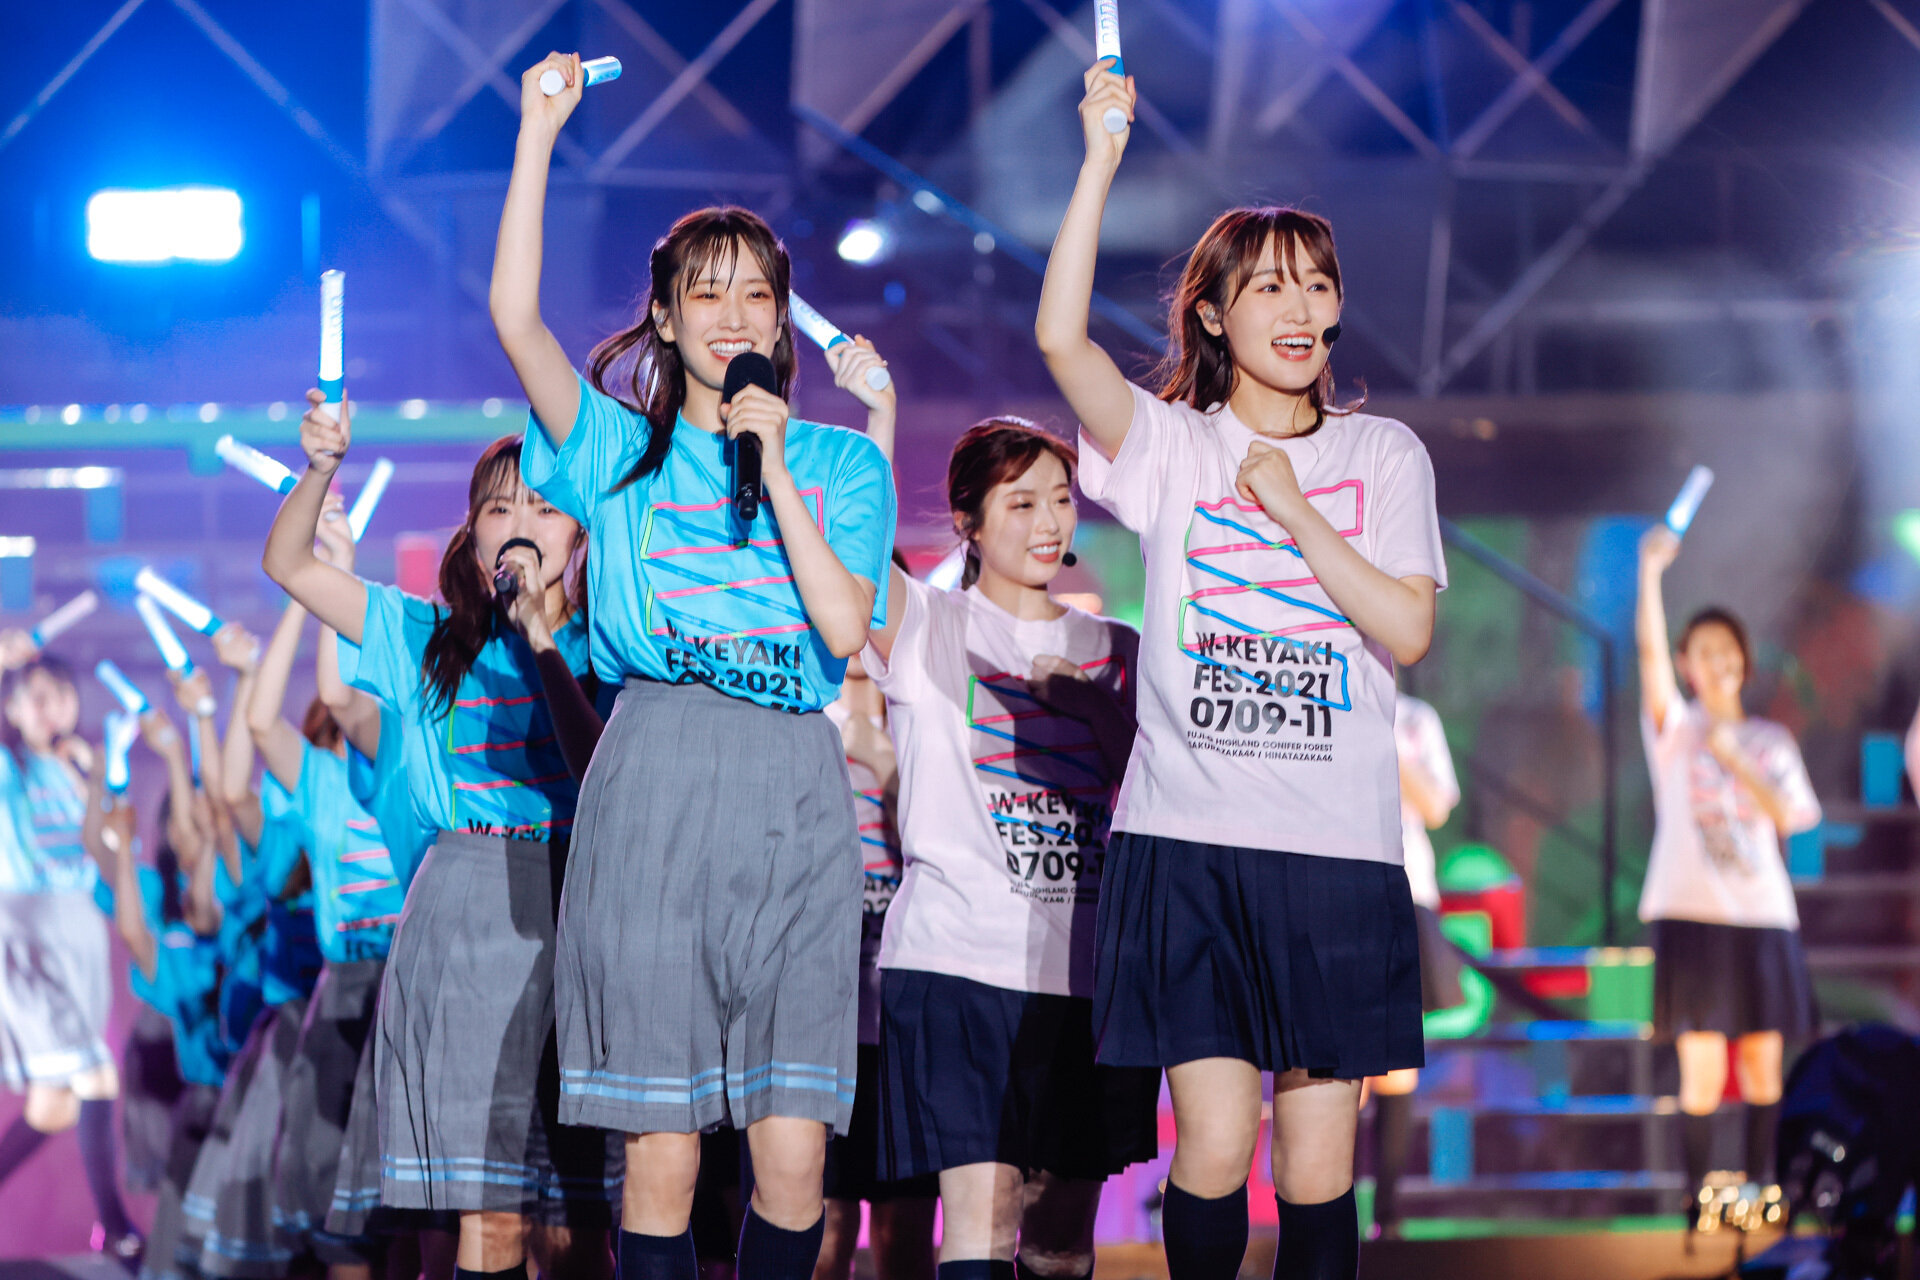 W-KEYAKI FES.2021 DAY3-0032.png